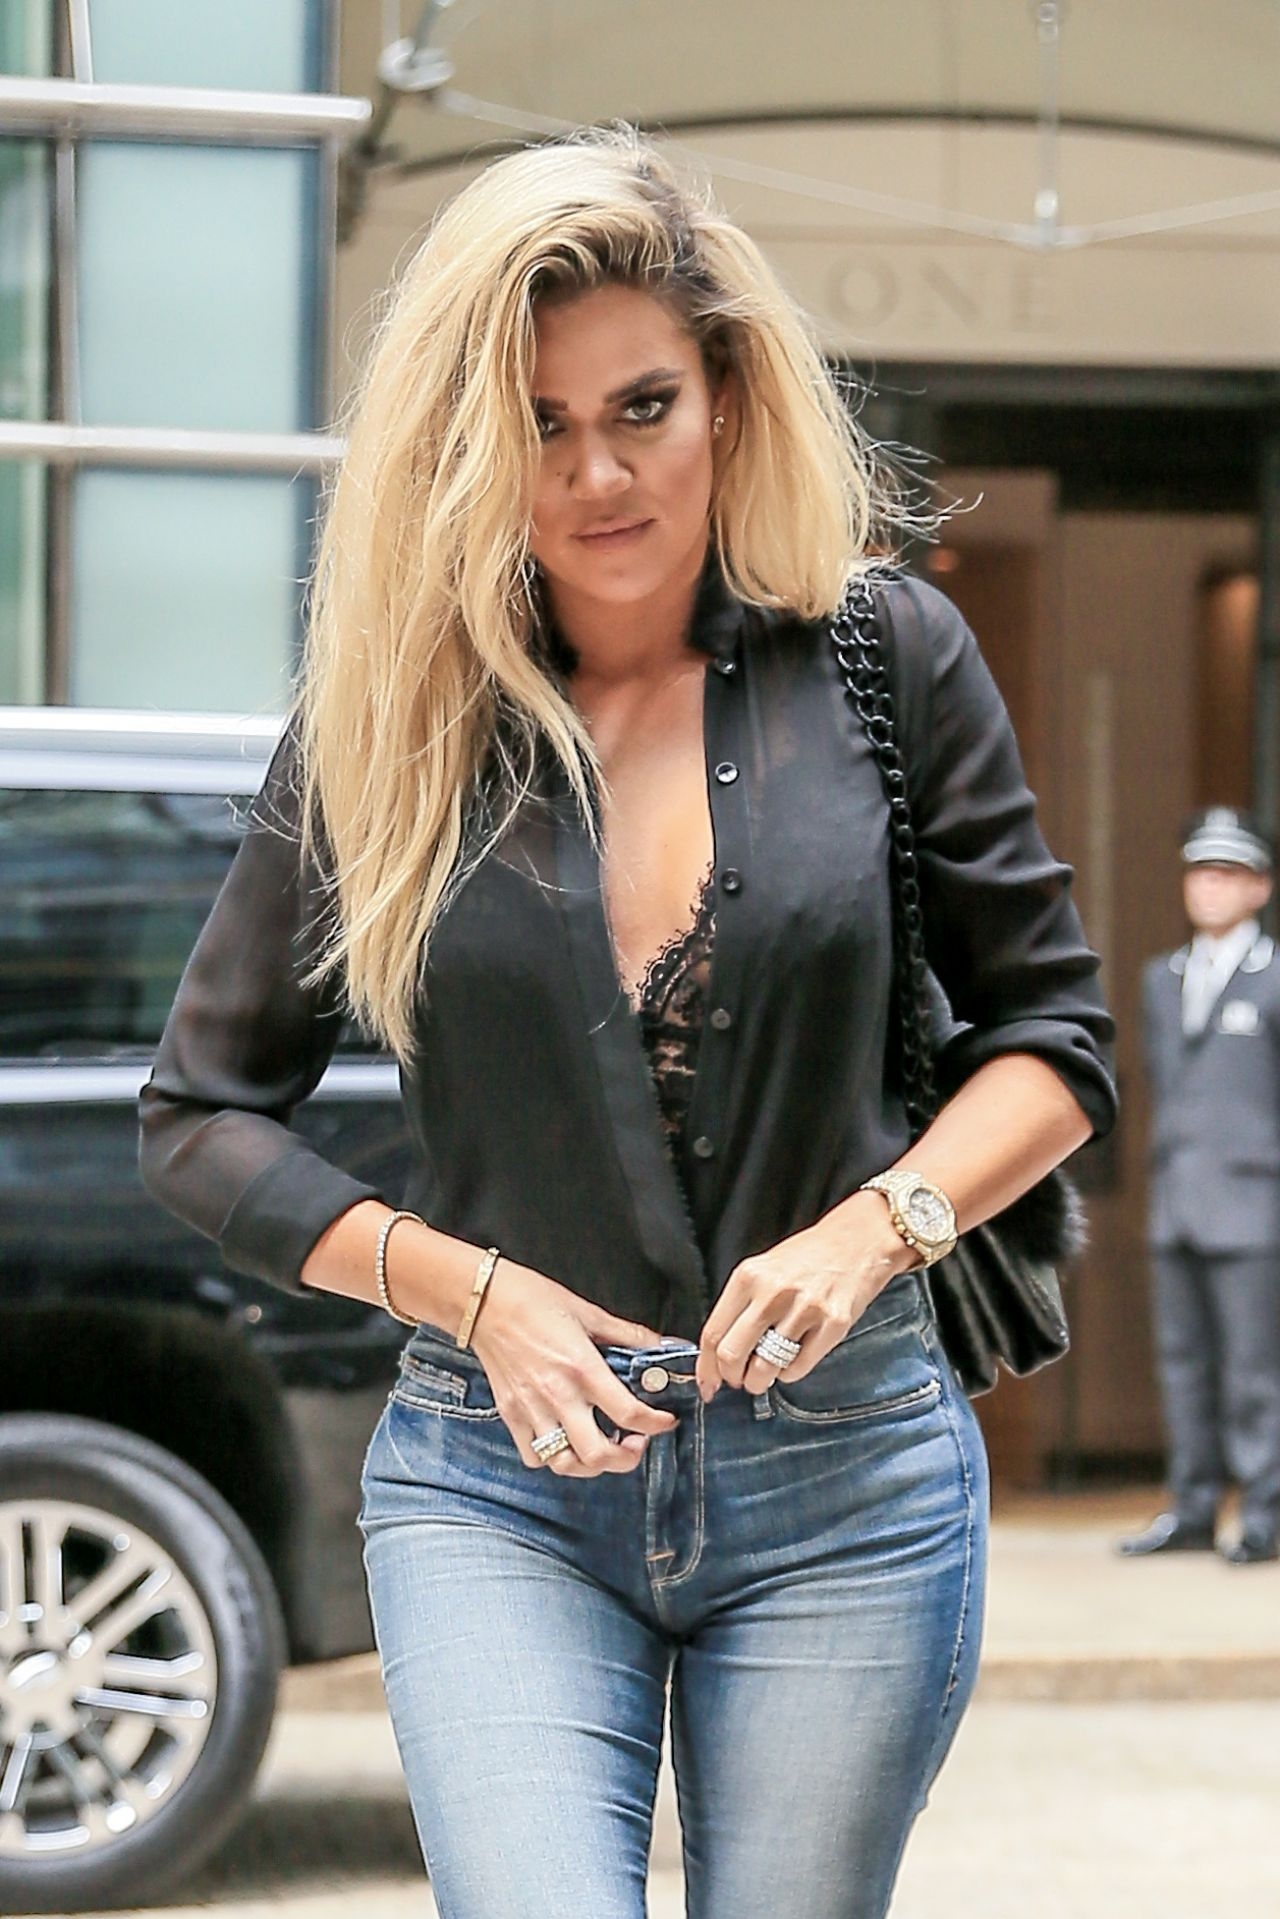 Khloe Kardashian Latest Photos Celebmafia